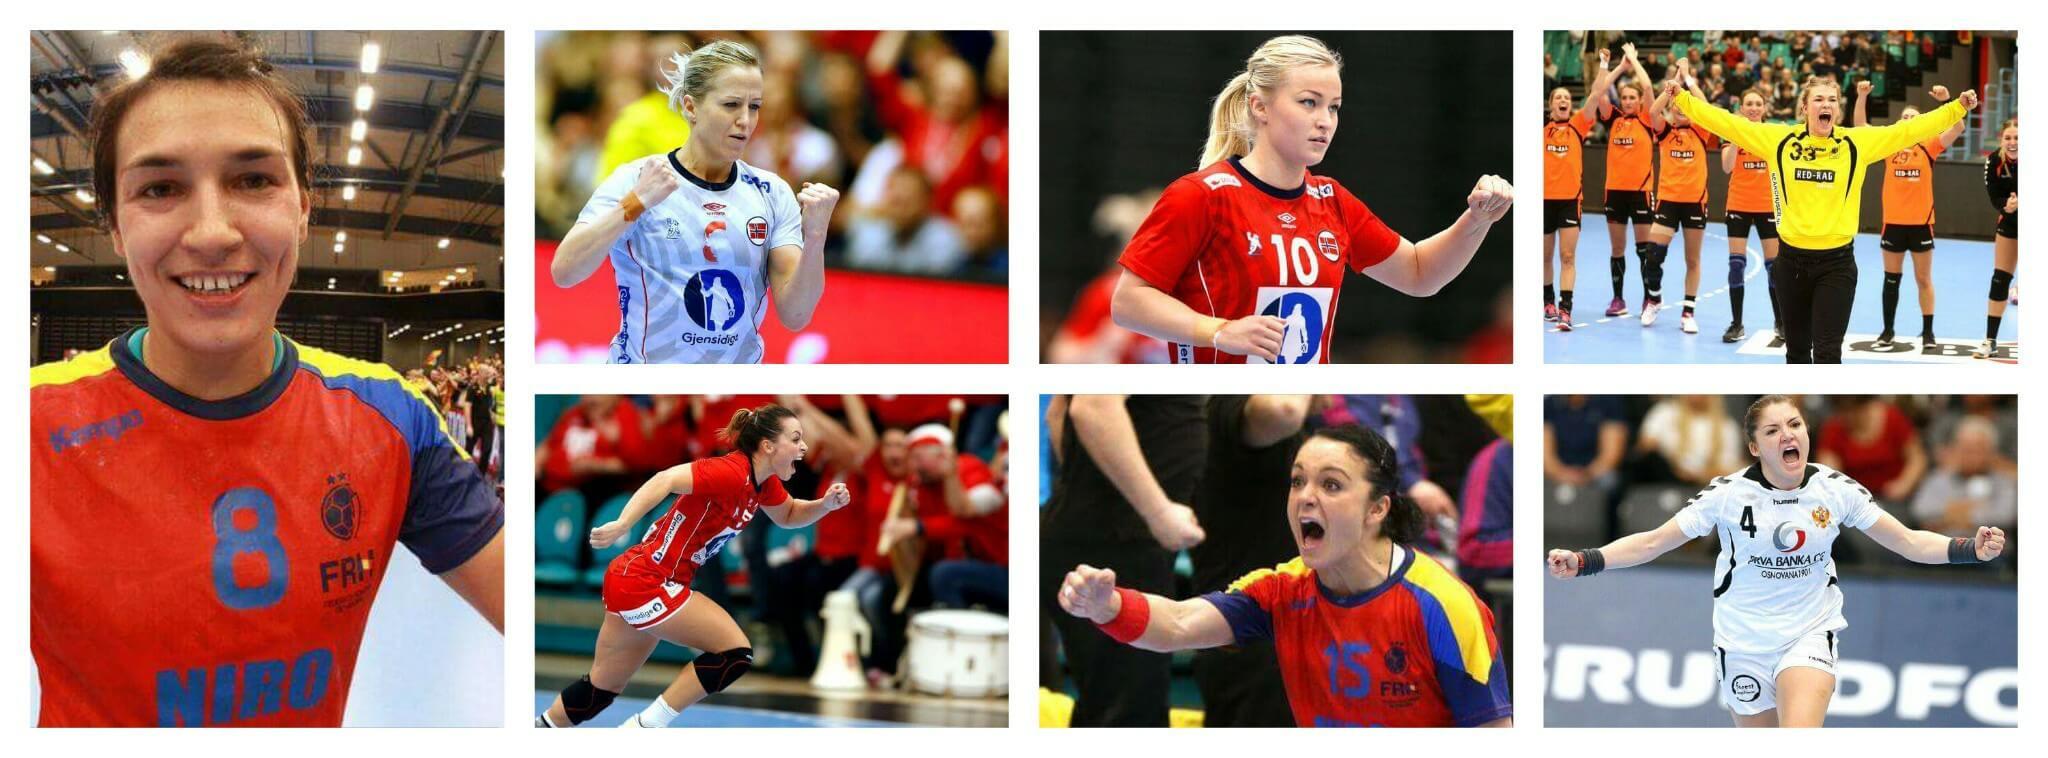 CM Danemarca 2015: All-Star Team CM Danemarca 2015: All-Star Team all star team cm 2015